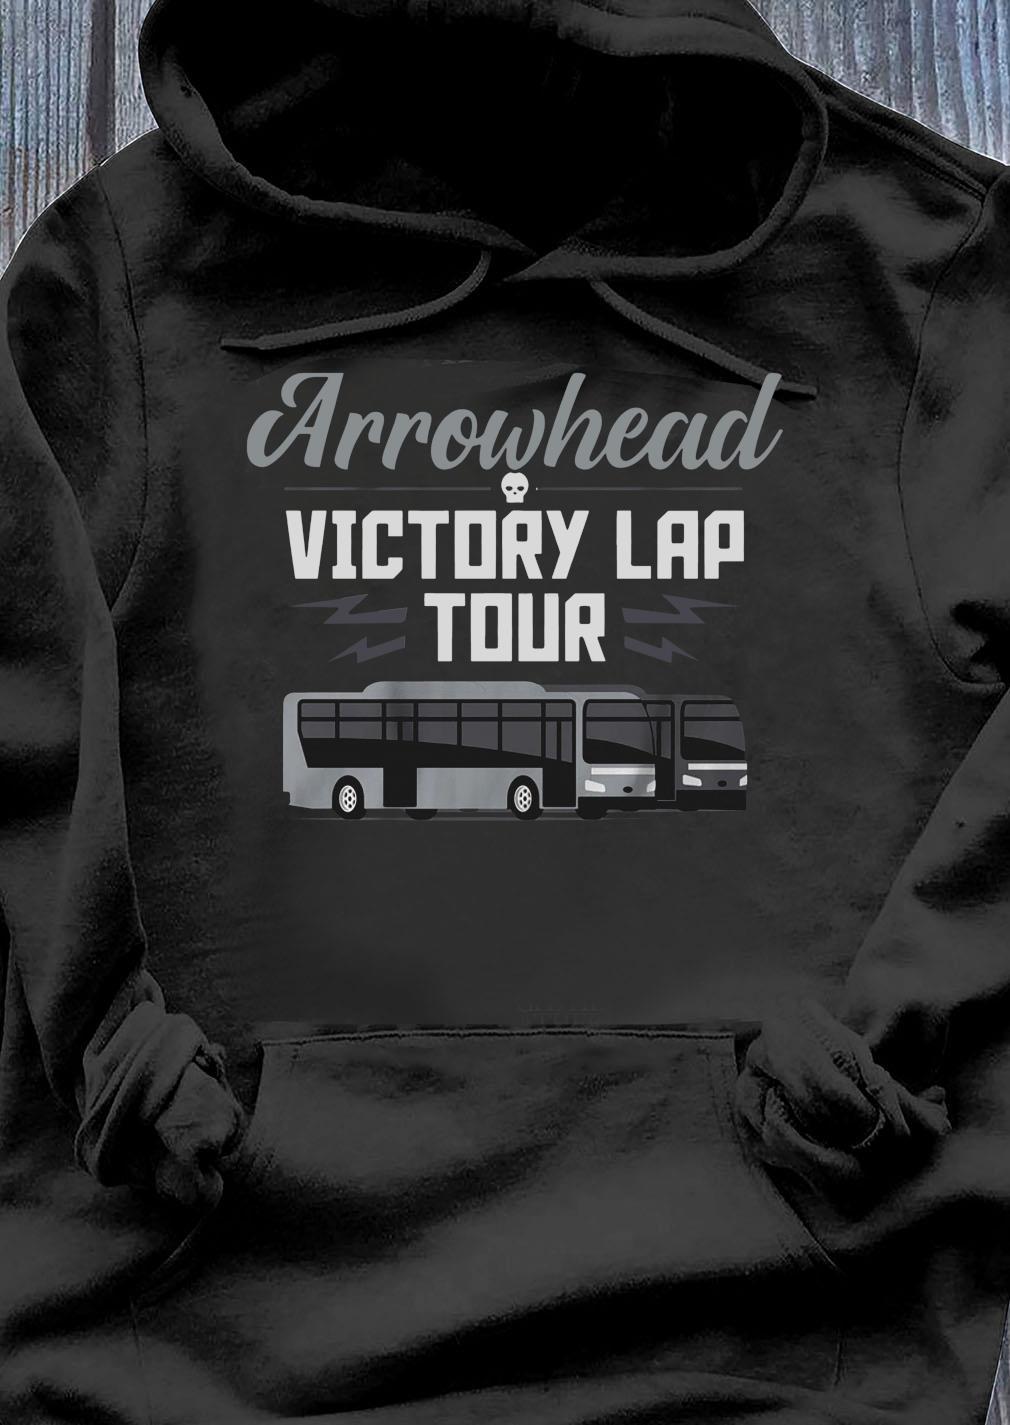 Arrowhead Victory Lap Tour Las Vegas Football Shirt Hoodie